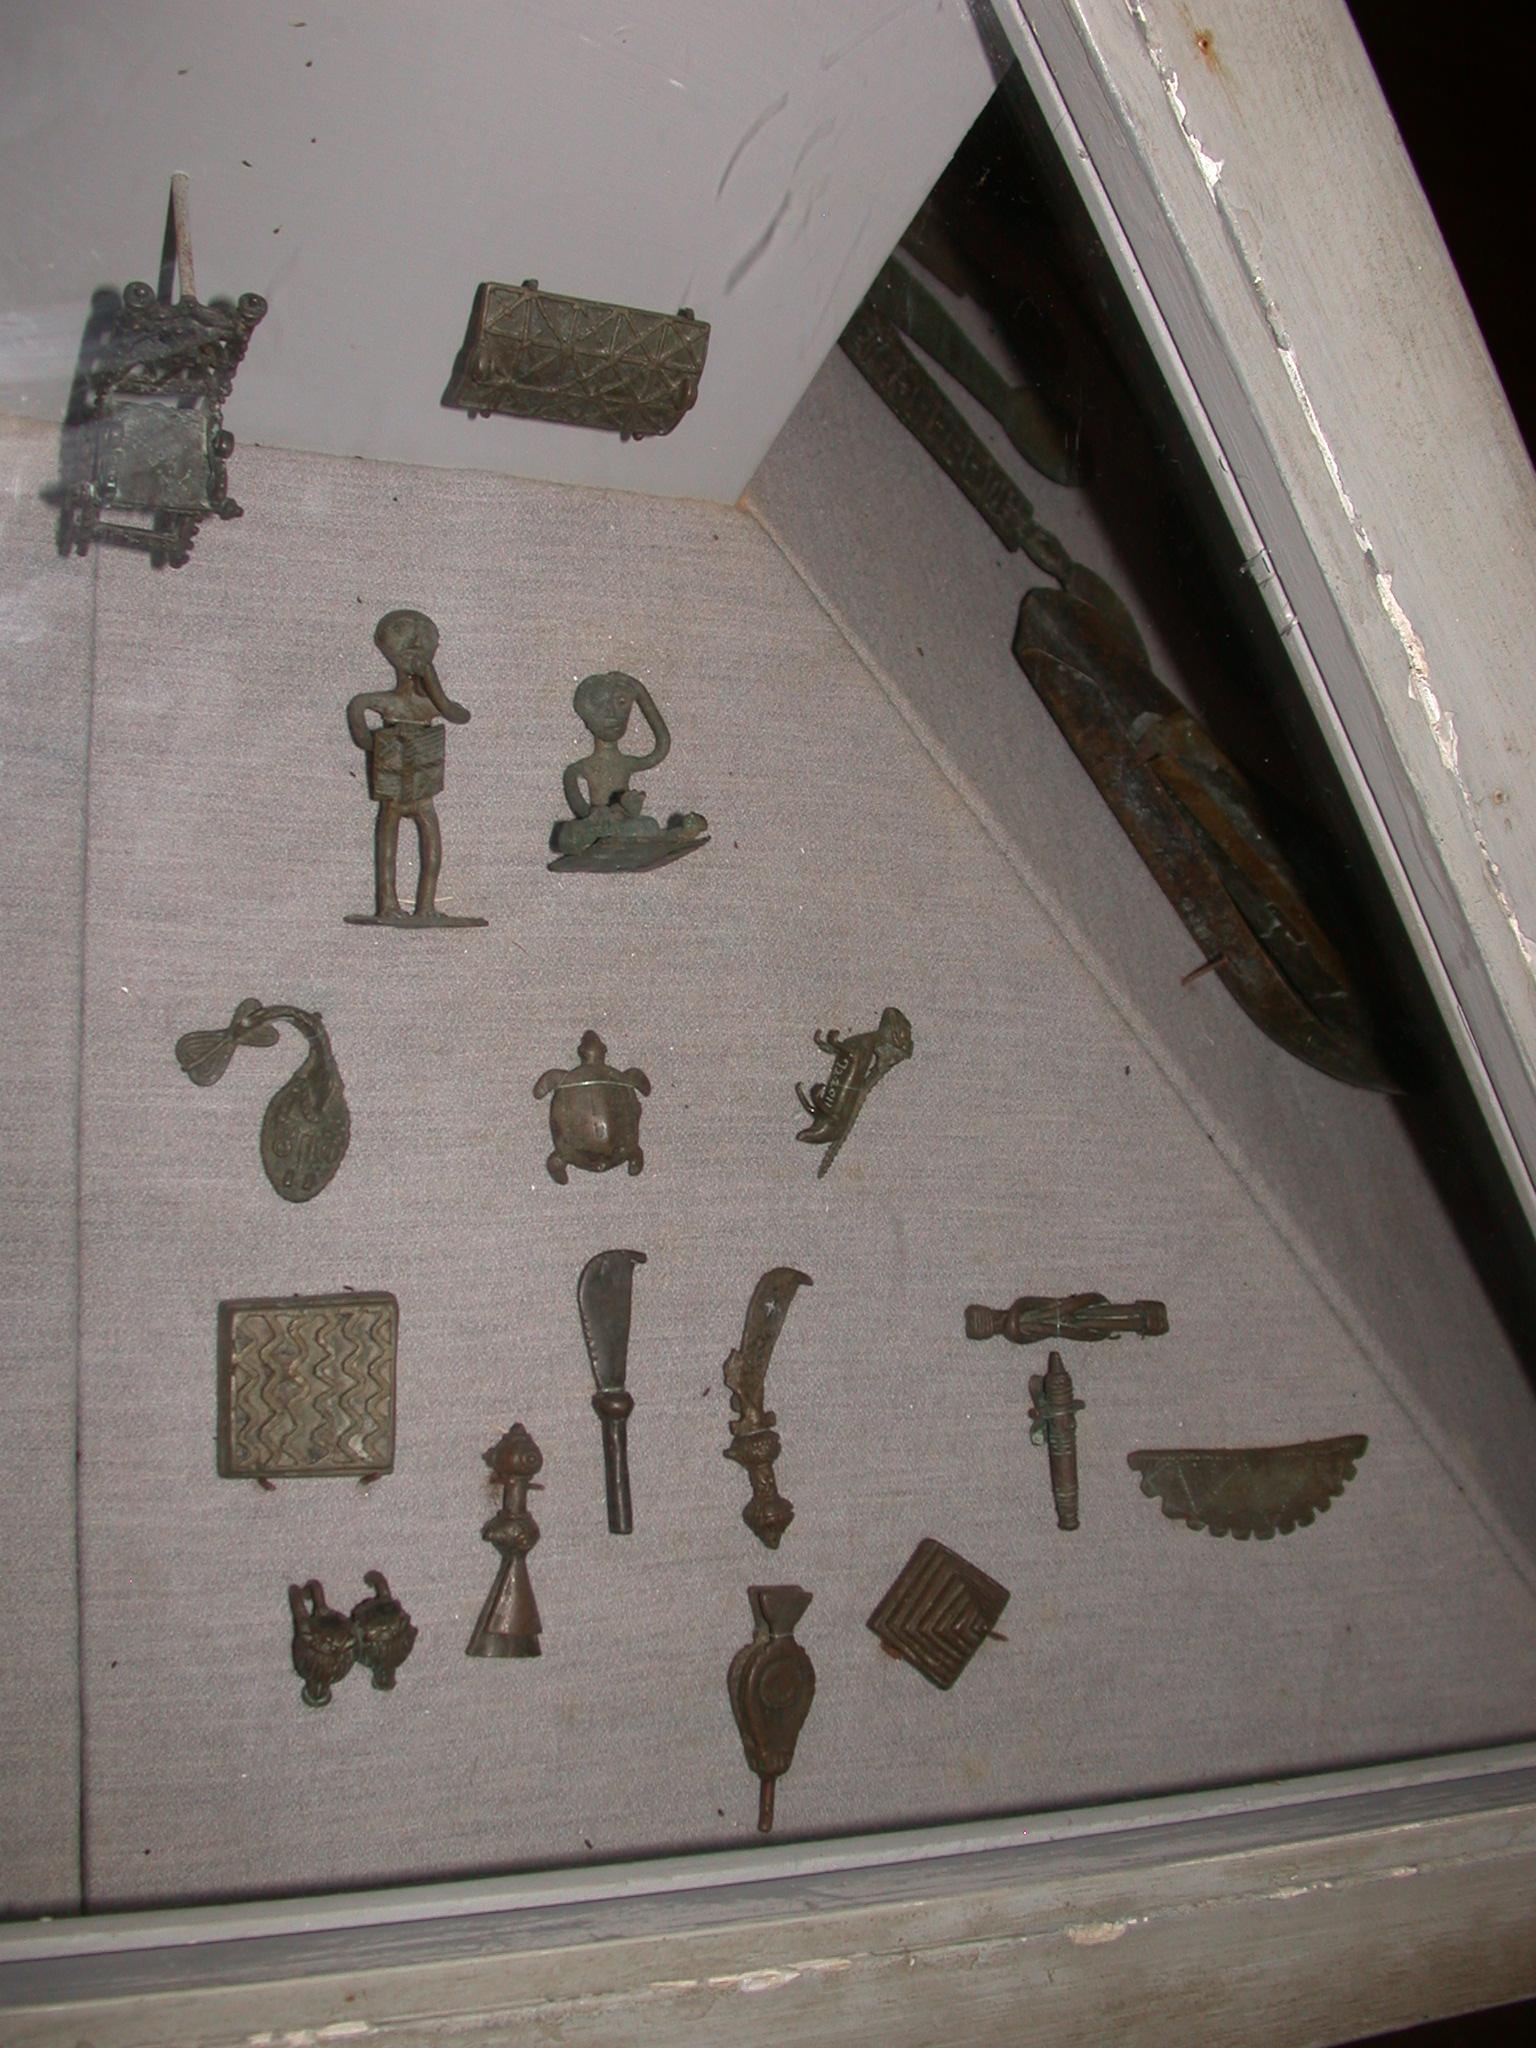 Ghana Gold Weights and Measures, Cape Coast Slave Fort Museum, Cape Coast, Ghana